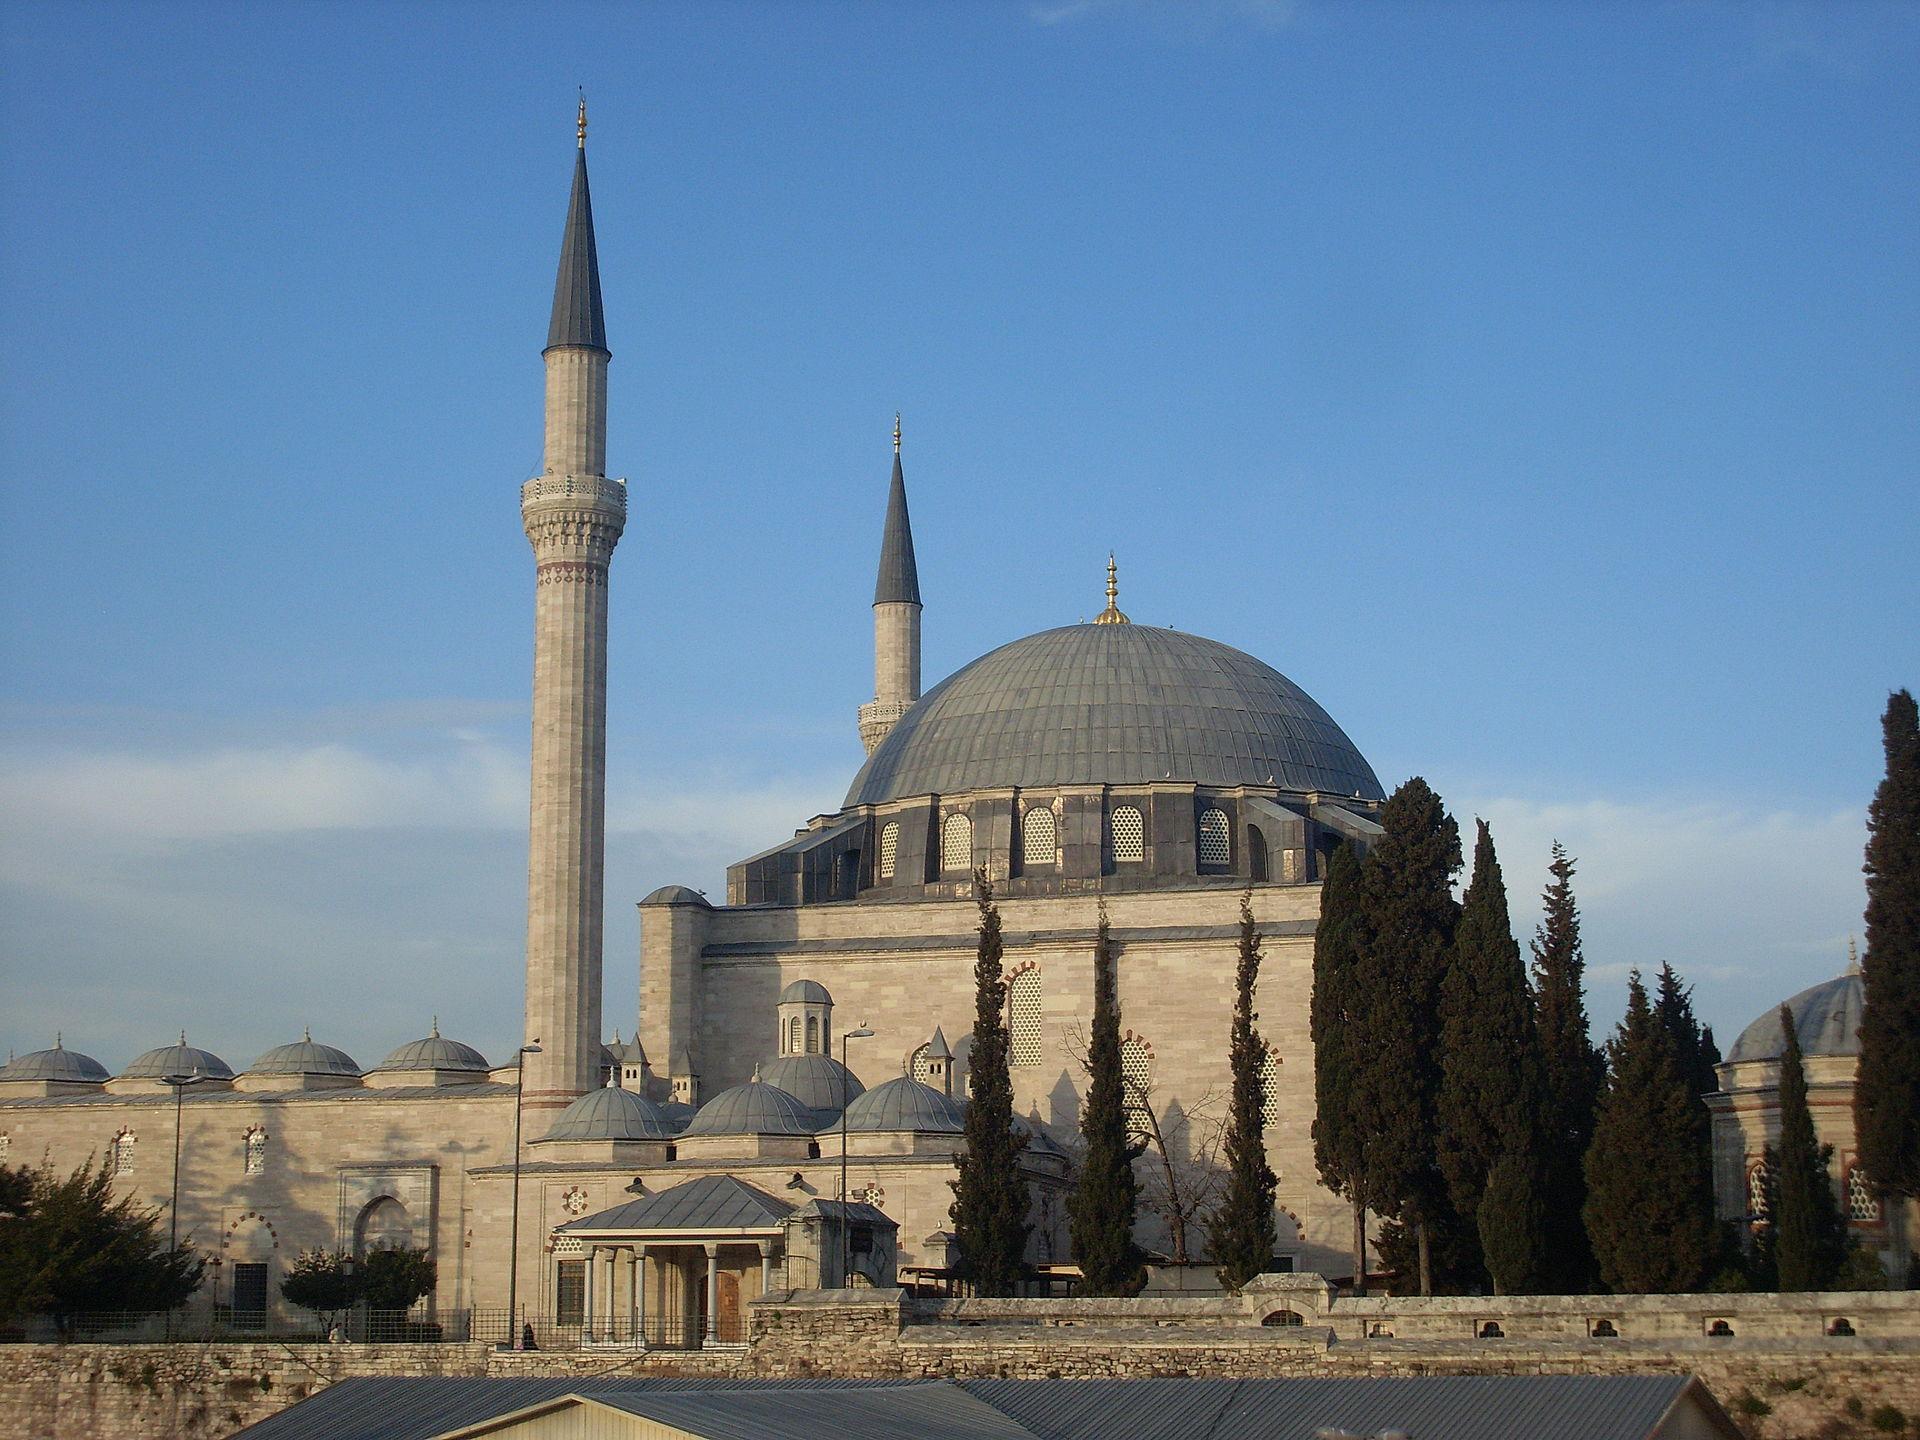 Yavuz Selim Mosque - Wikipedia